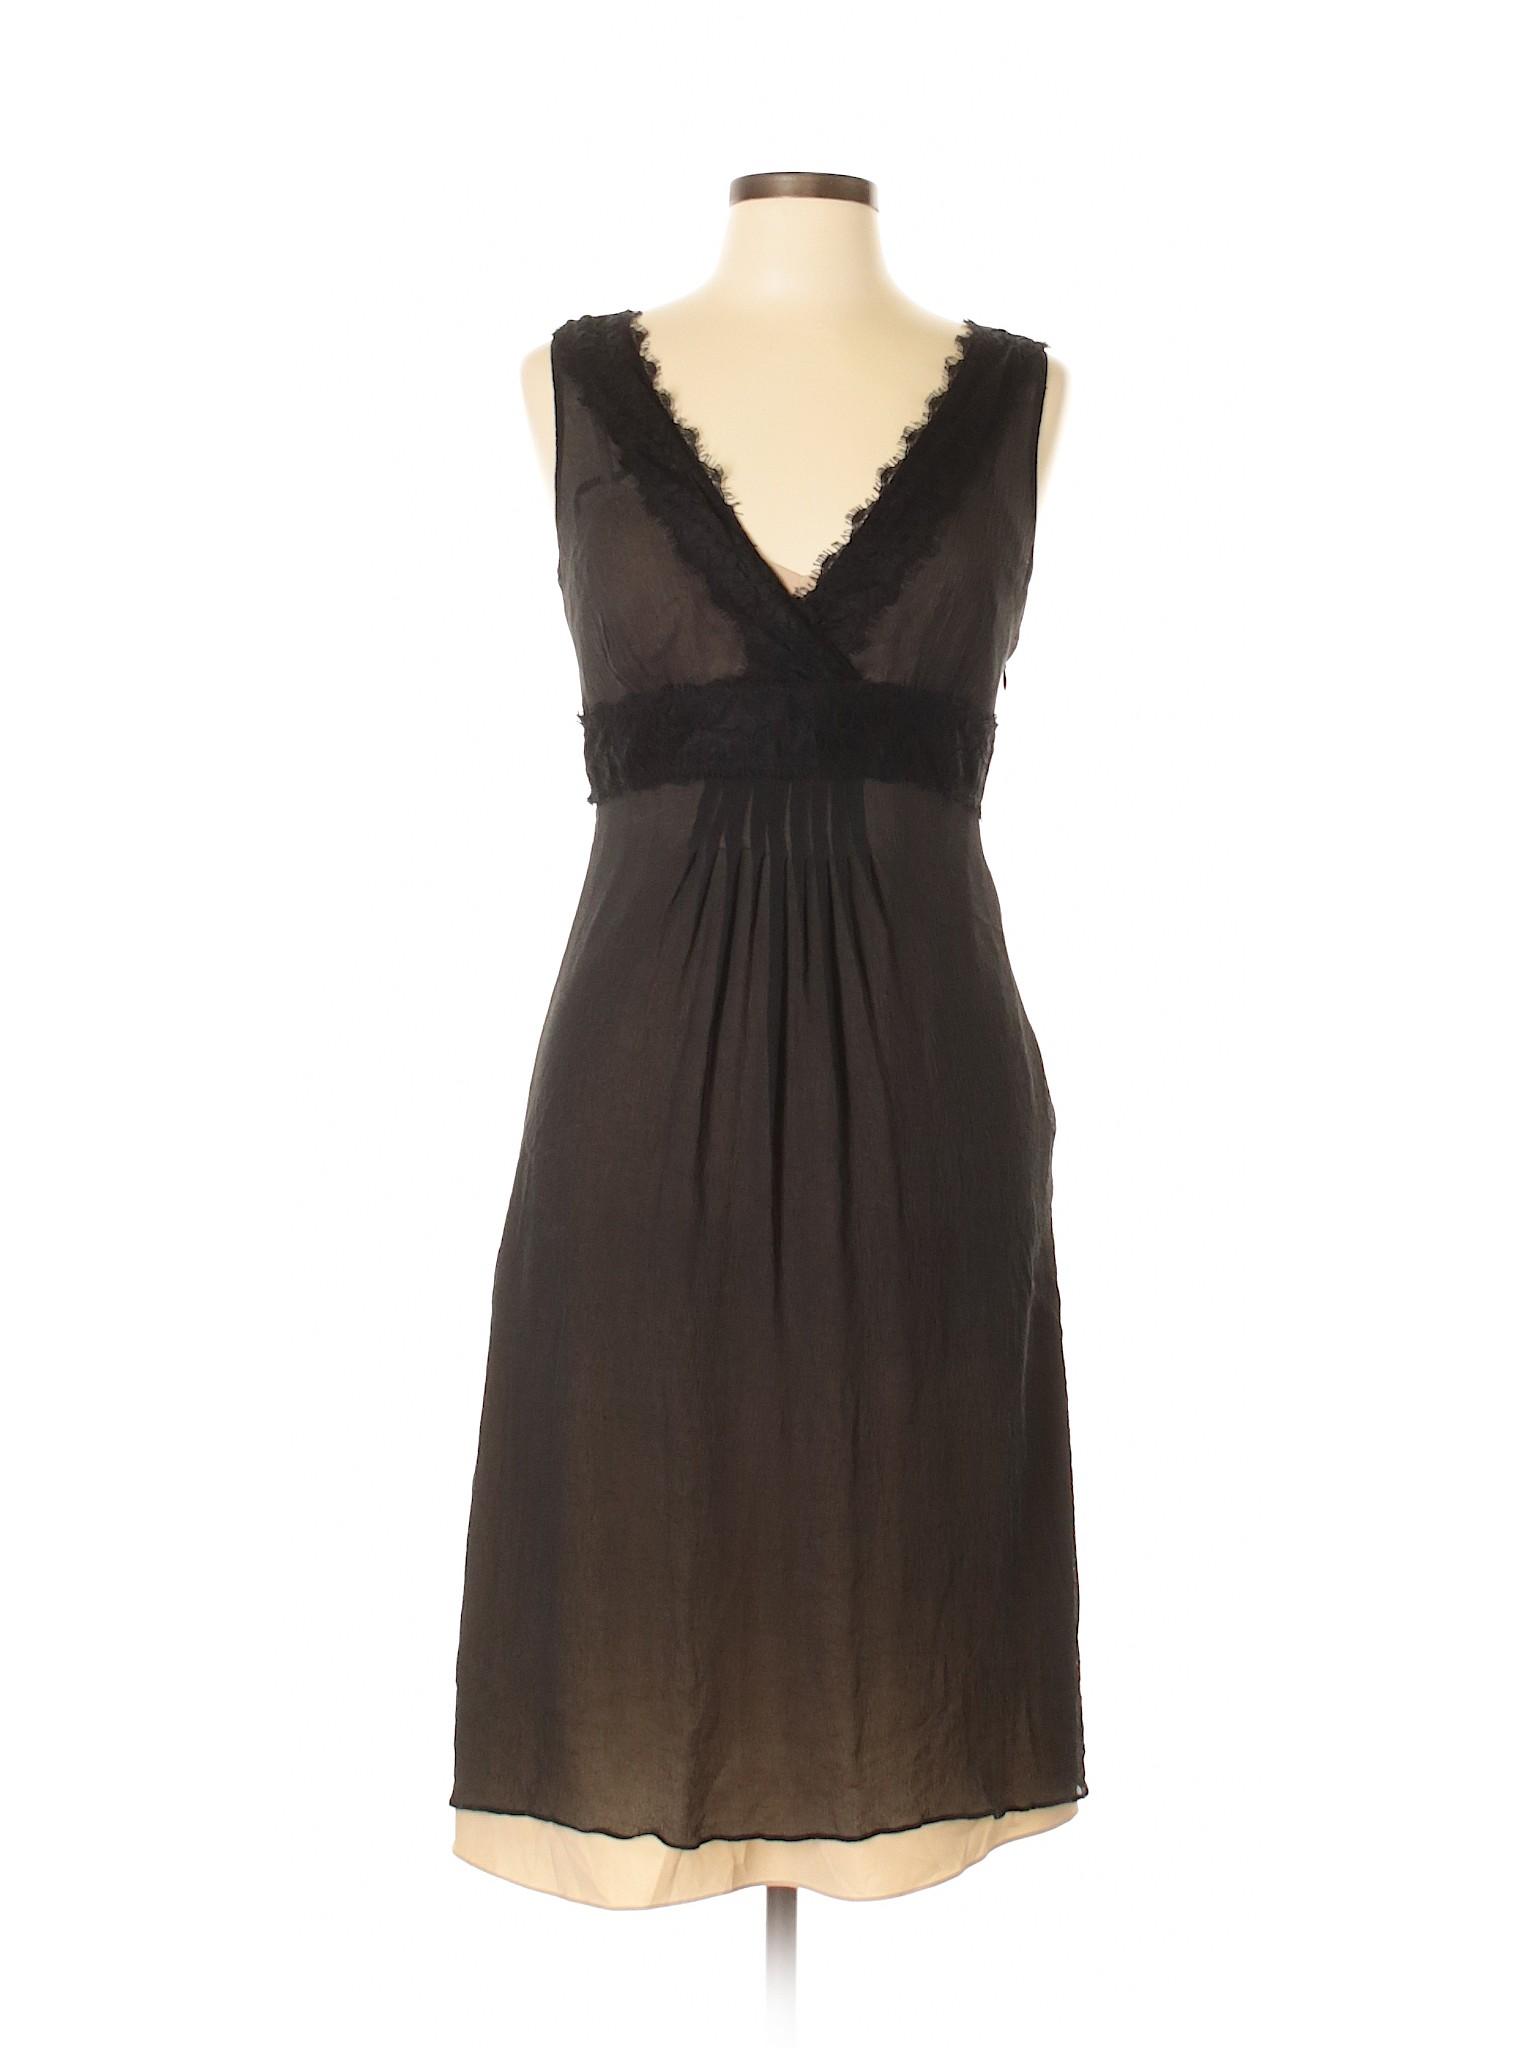 Ann Casual Dress winter Taylor Boutique LOFT 1Bg5Bq